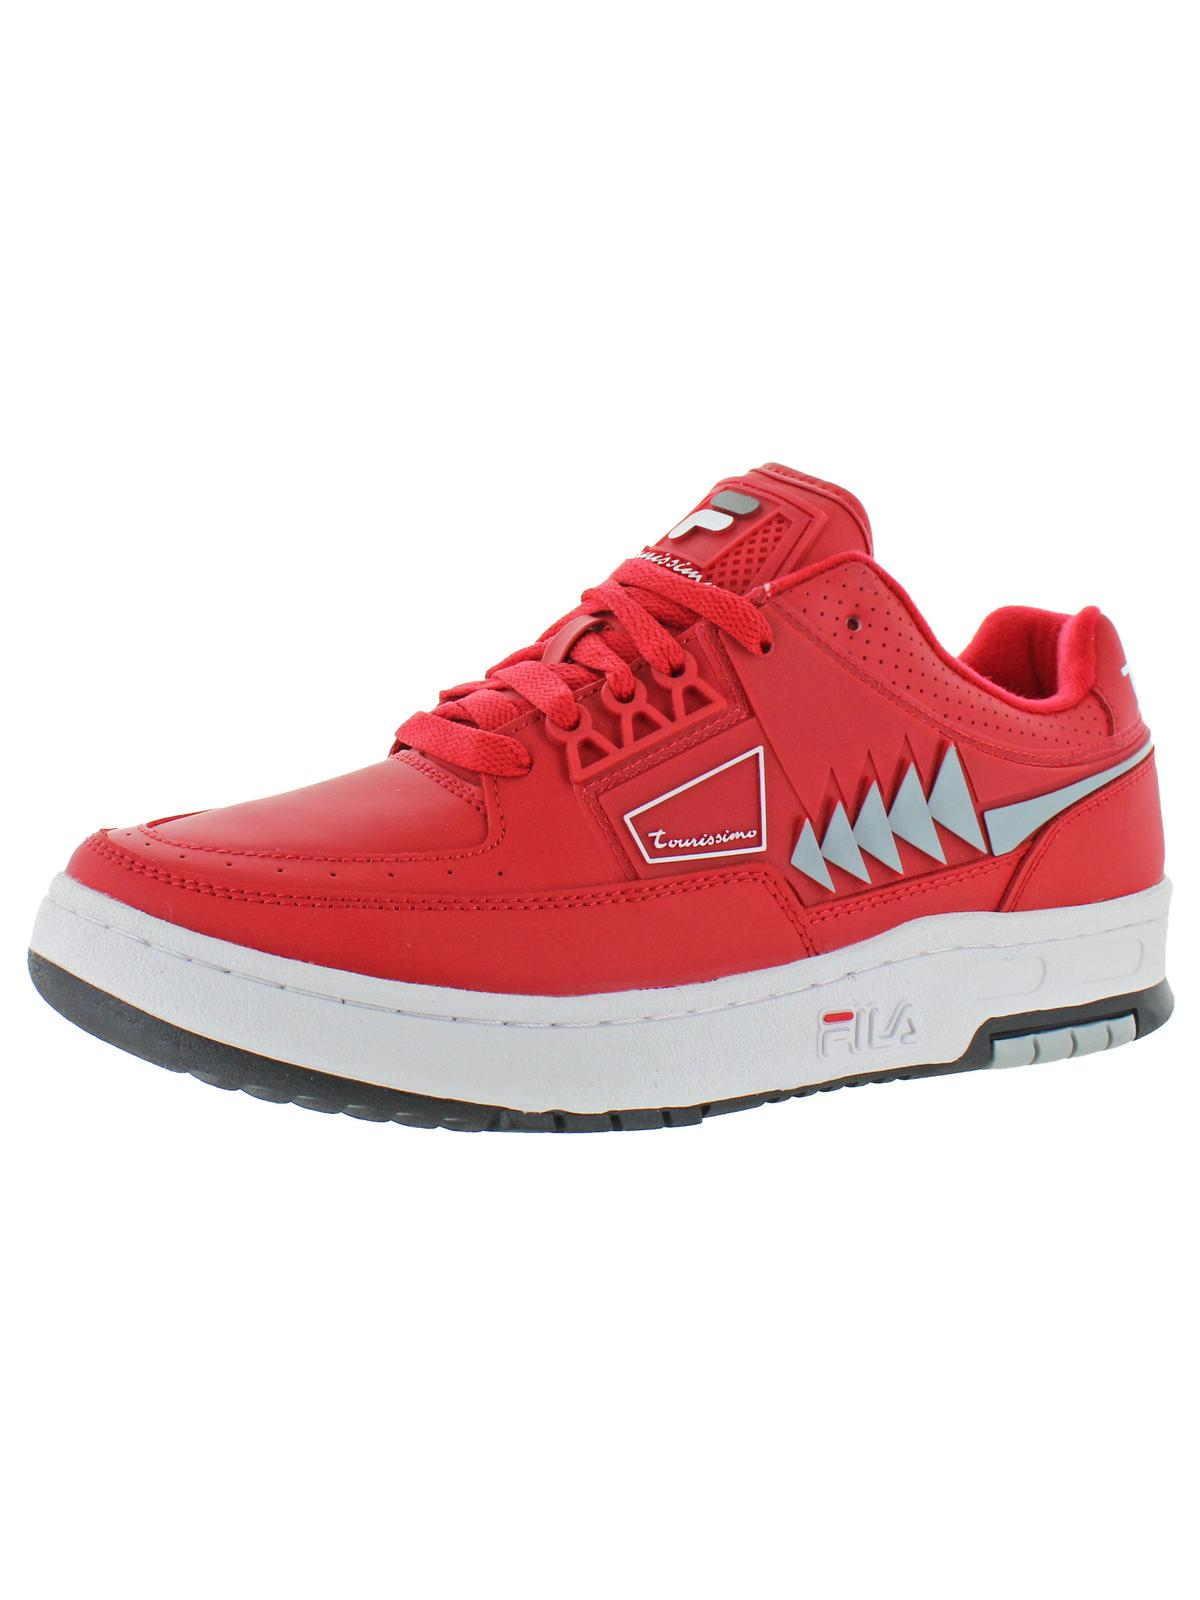 Fila Fila Mens Tourissimo Low Leather Padded Insole Fashion Sneakers